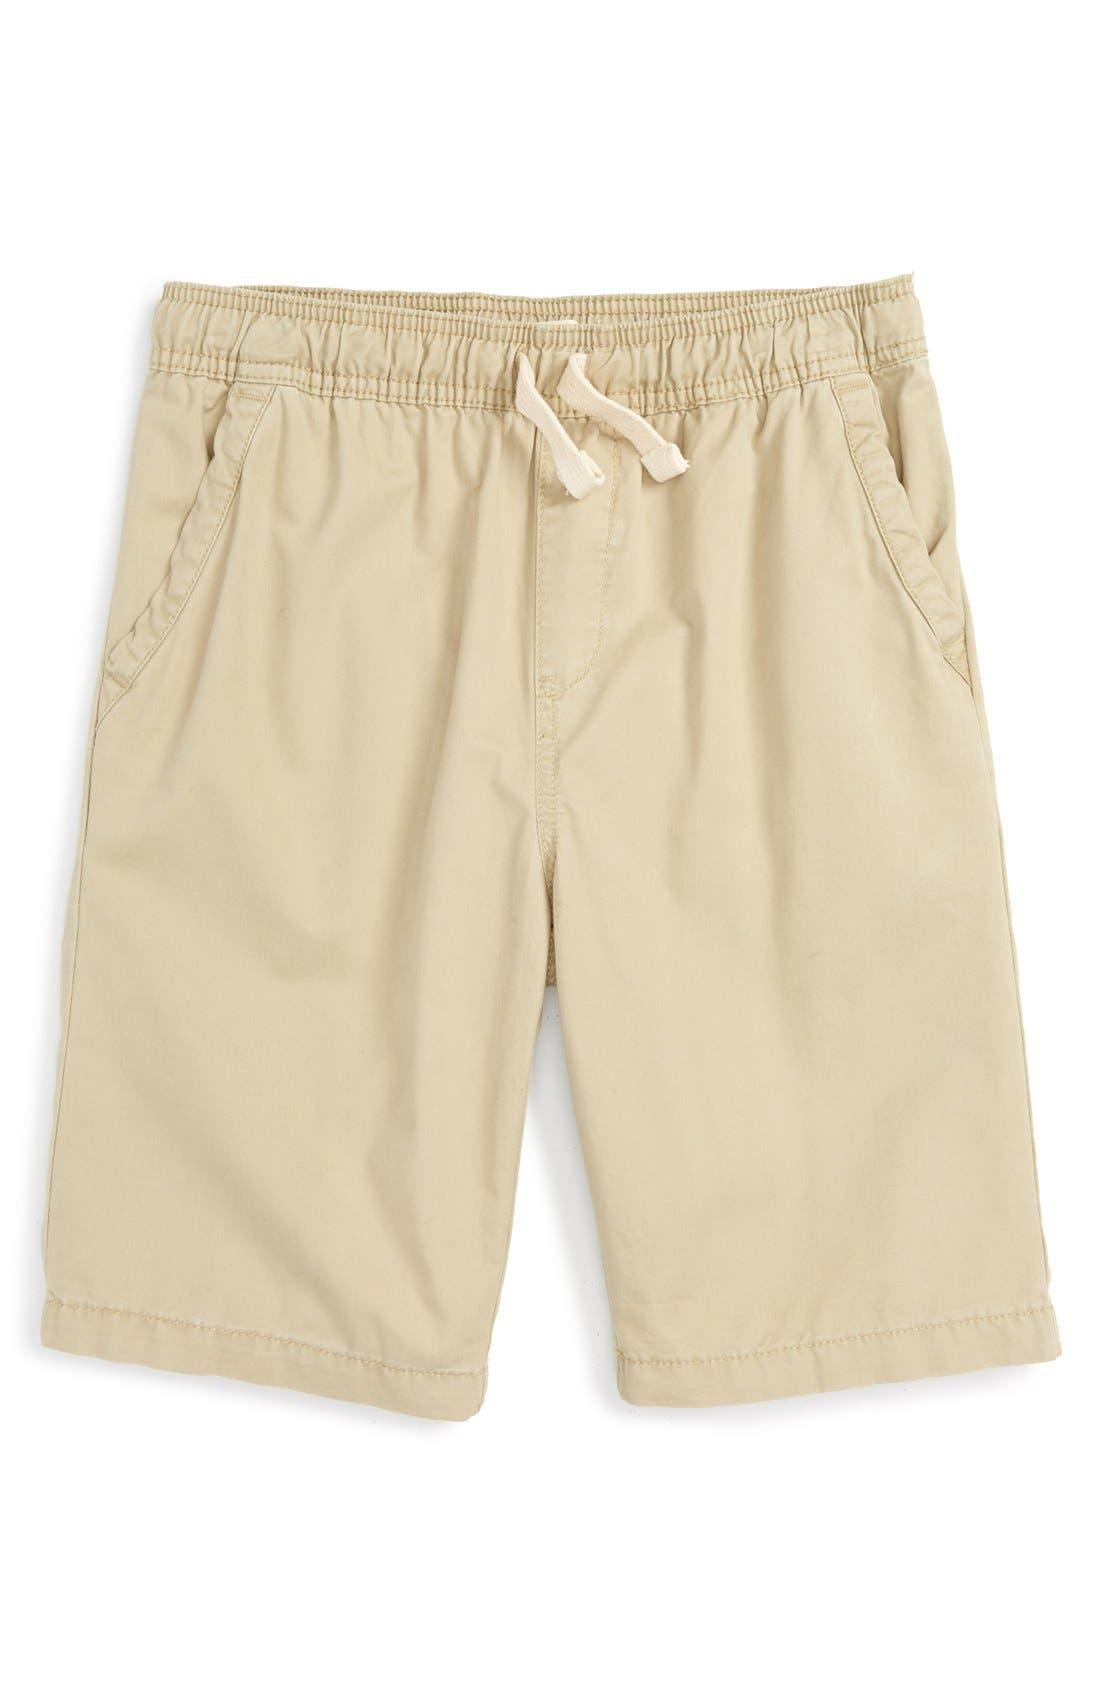 Cotton Twill Shorts,                         Main,                         color, Tan Twill